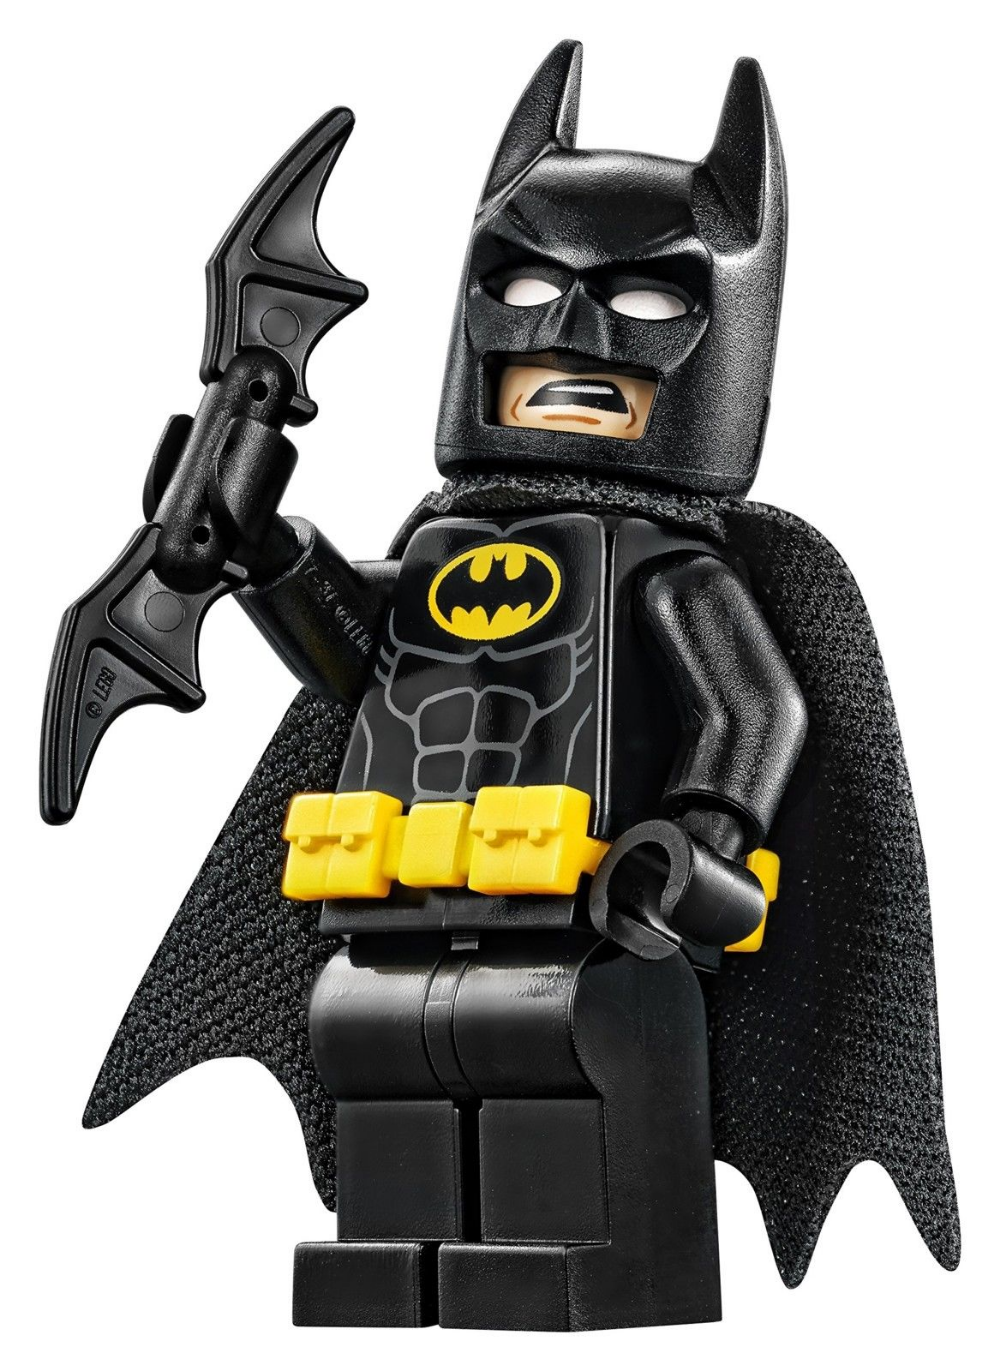 Lego Batman Movie The Scuttler 70908 673419267878 Ebay Lego Batman Movie Lego Batman Batman Movie